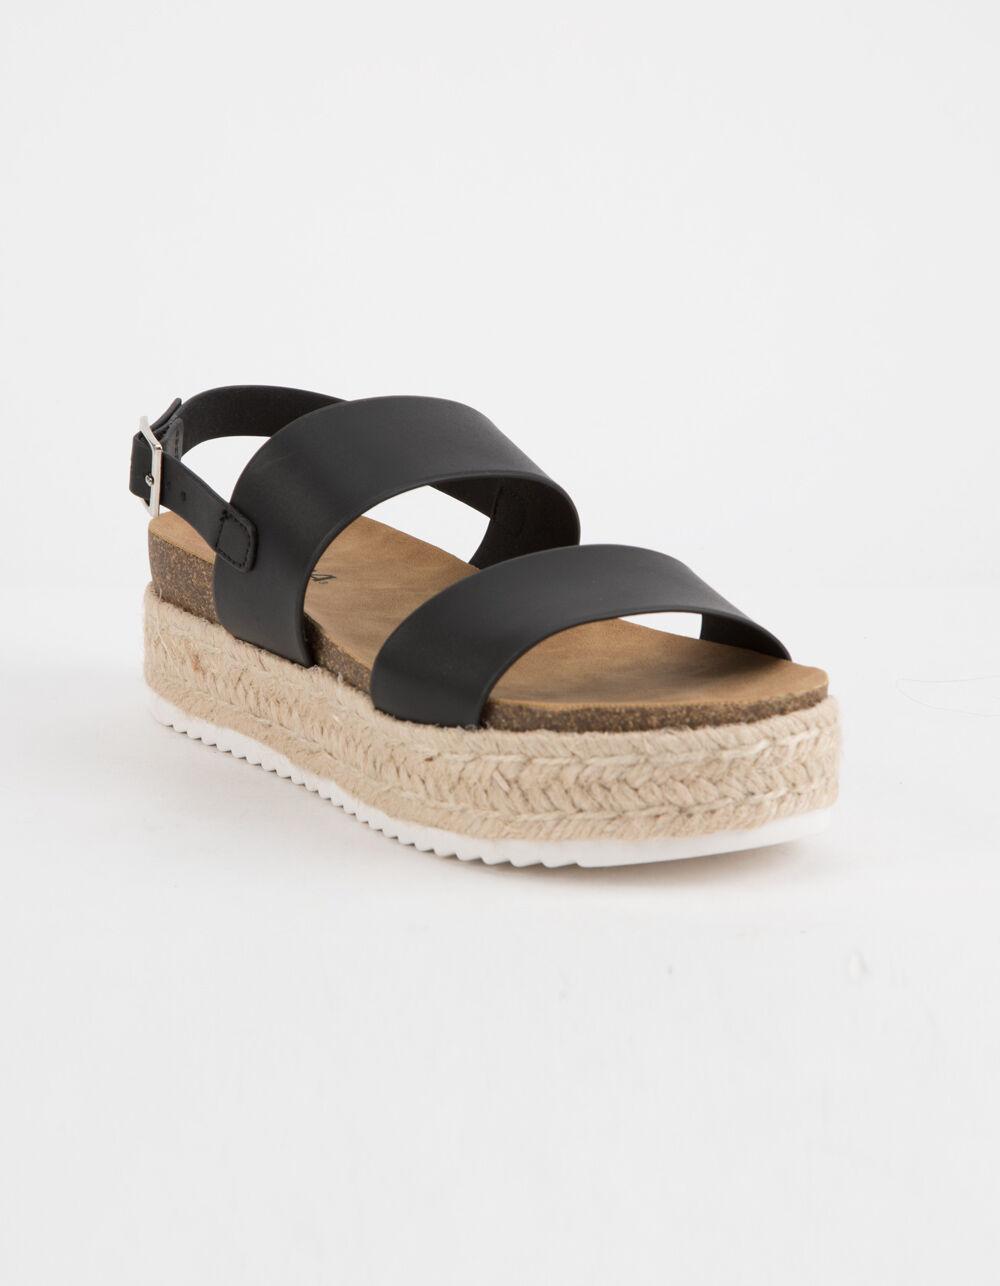 SODA 2 Strap Black Espadrille Flatform Sandals